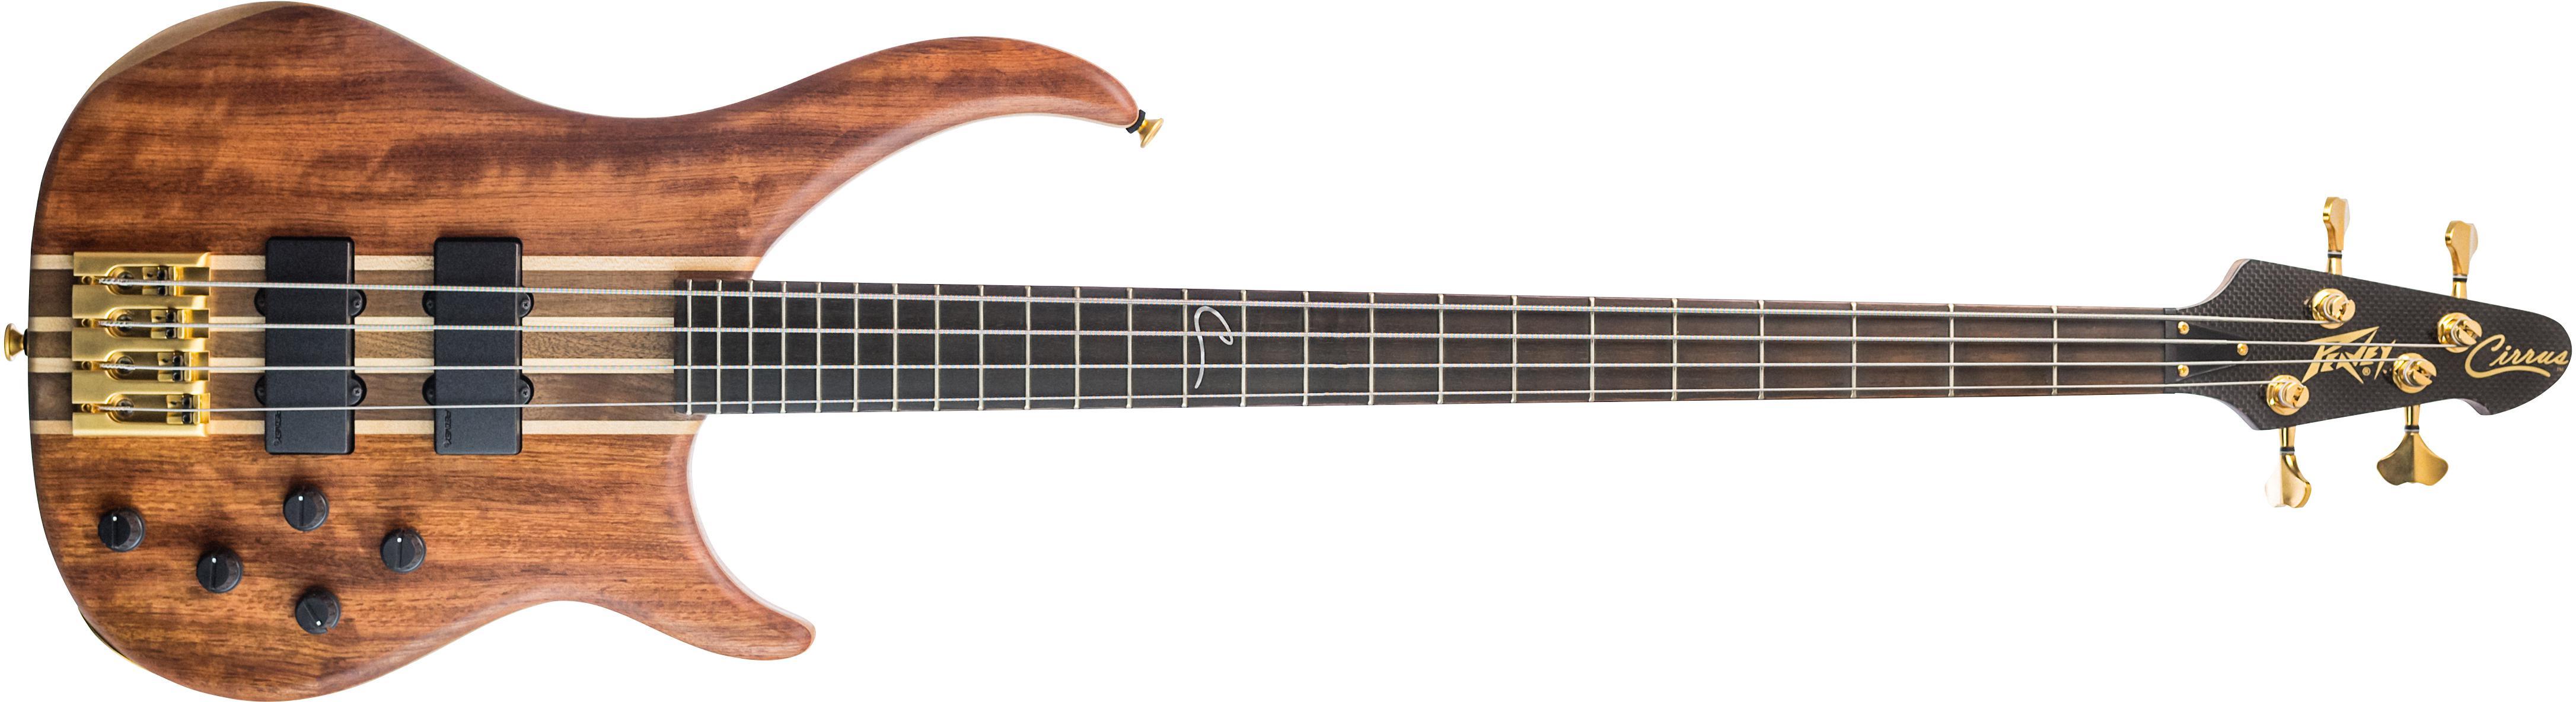 cirrus 4 bubinga 4 string bass guitar peavey. Black Bedroom Furniture Sets. Home Design Ideas